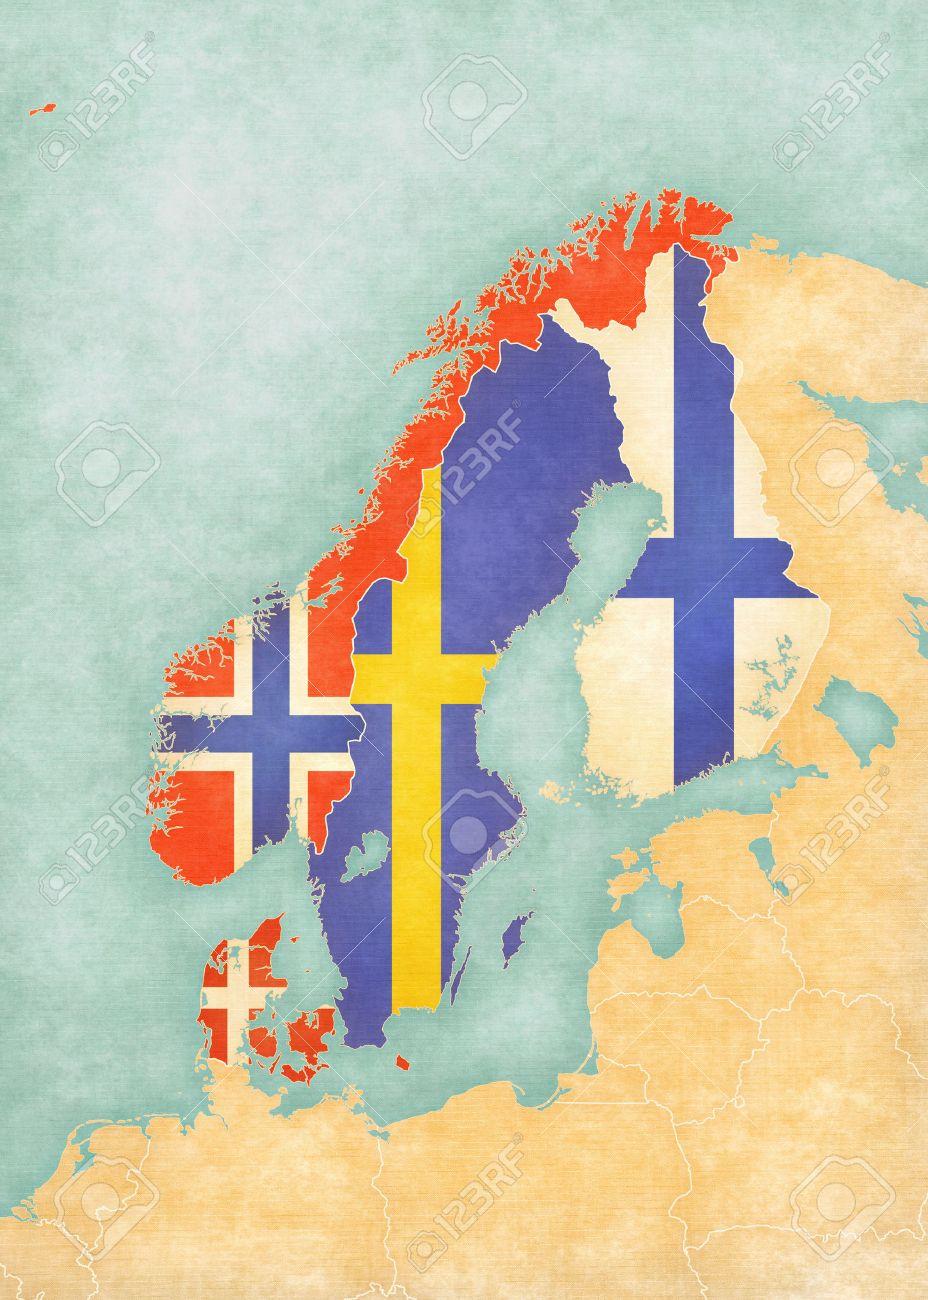 Karte Skandinavien.Stock Photo